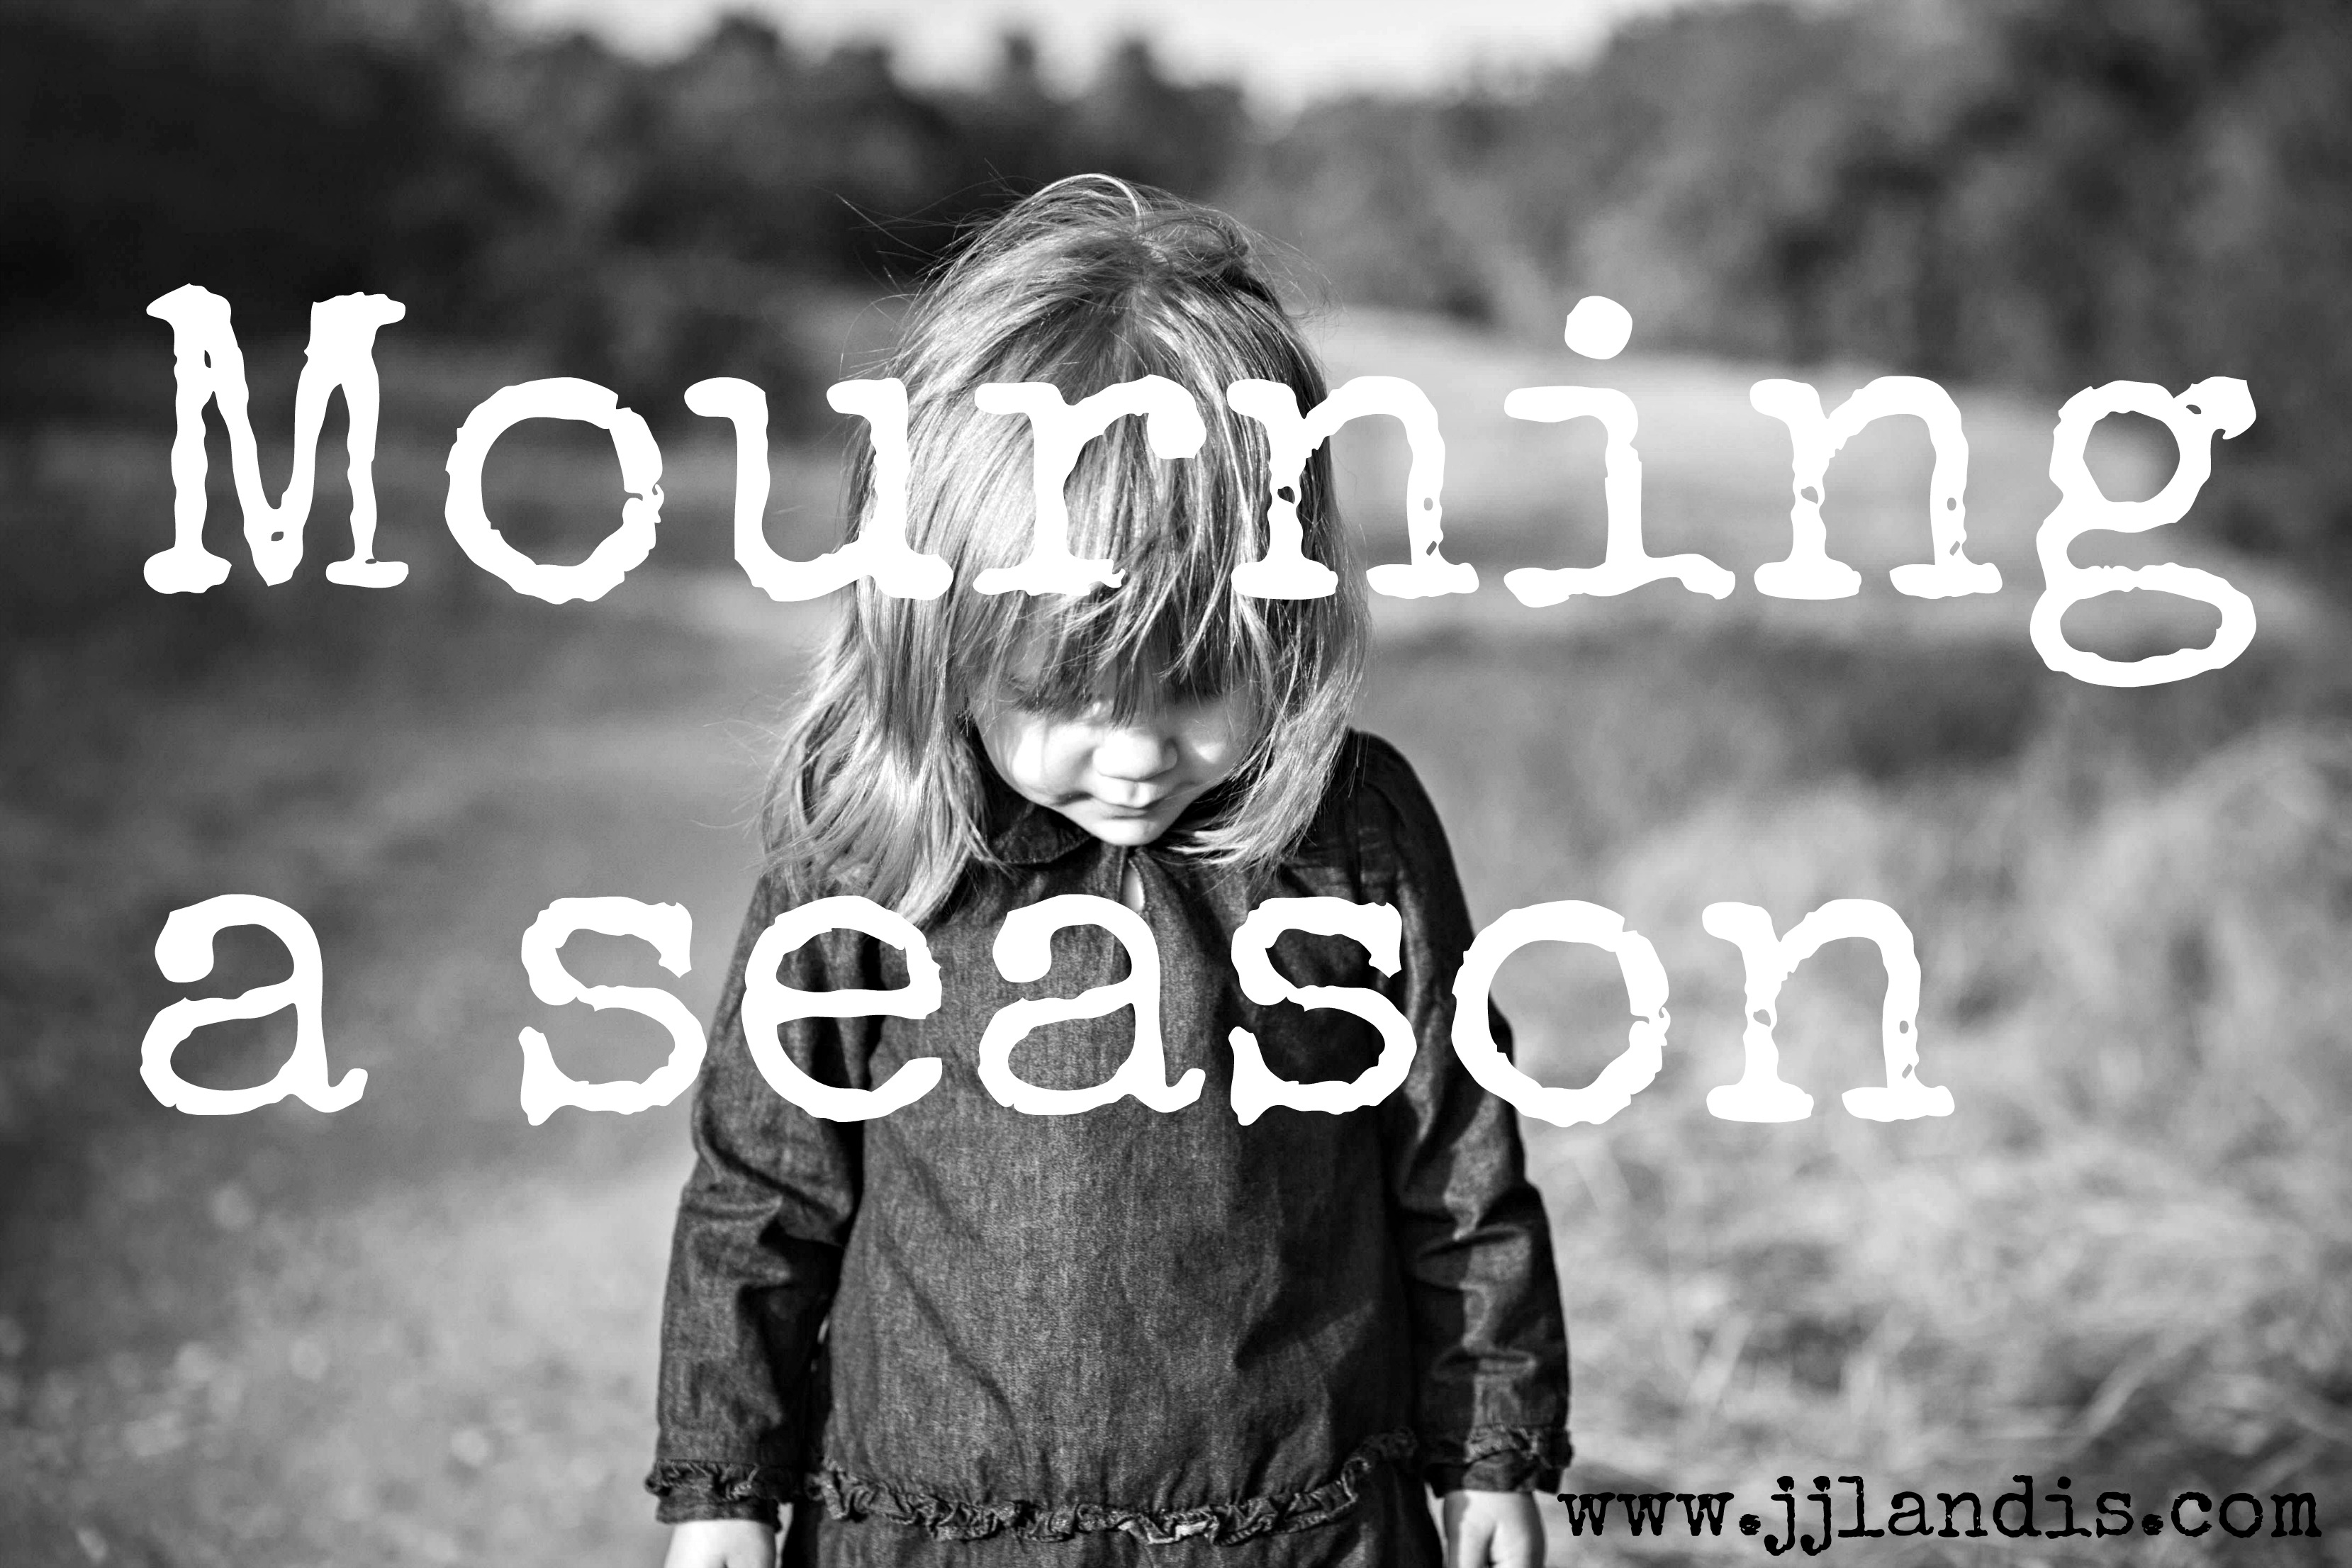 playground visit and changing seasons